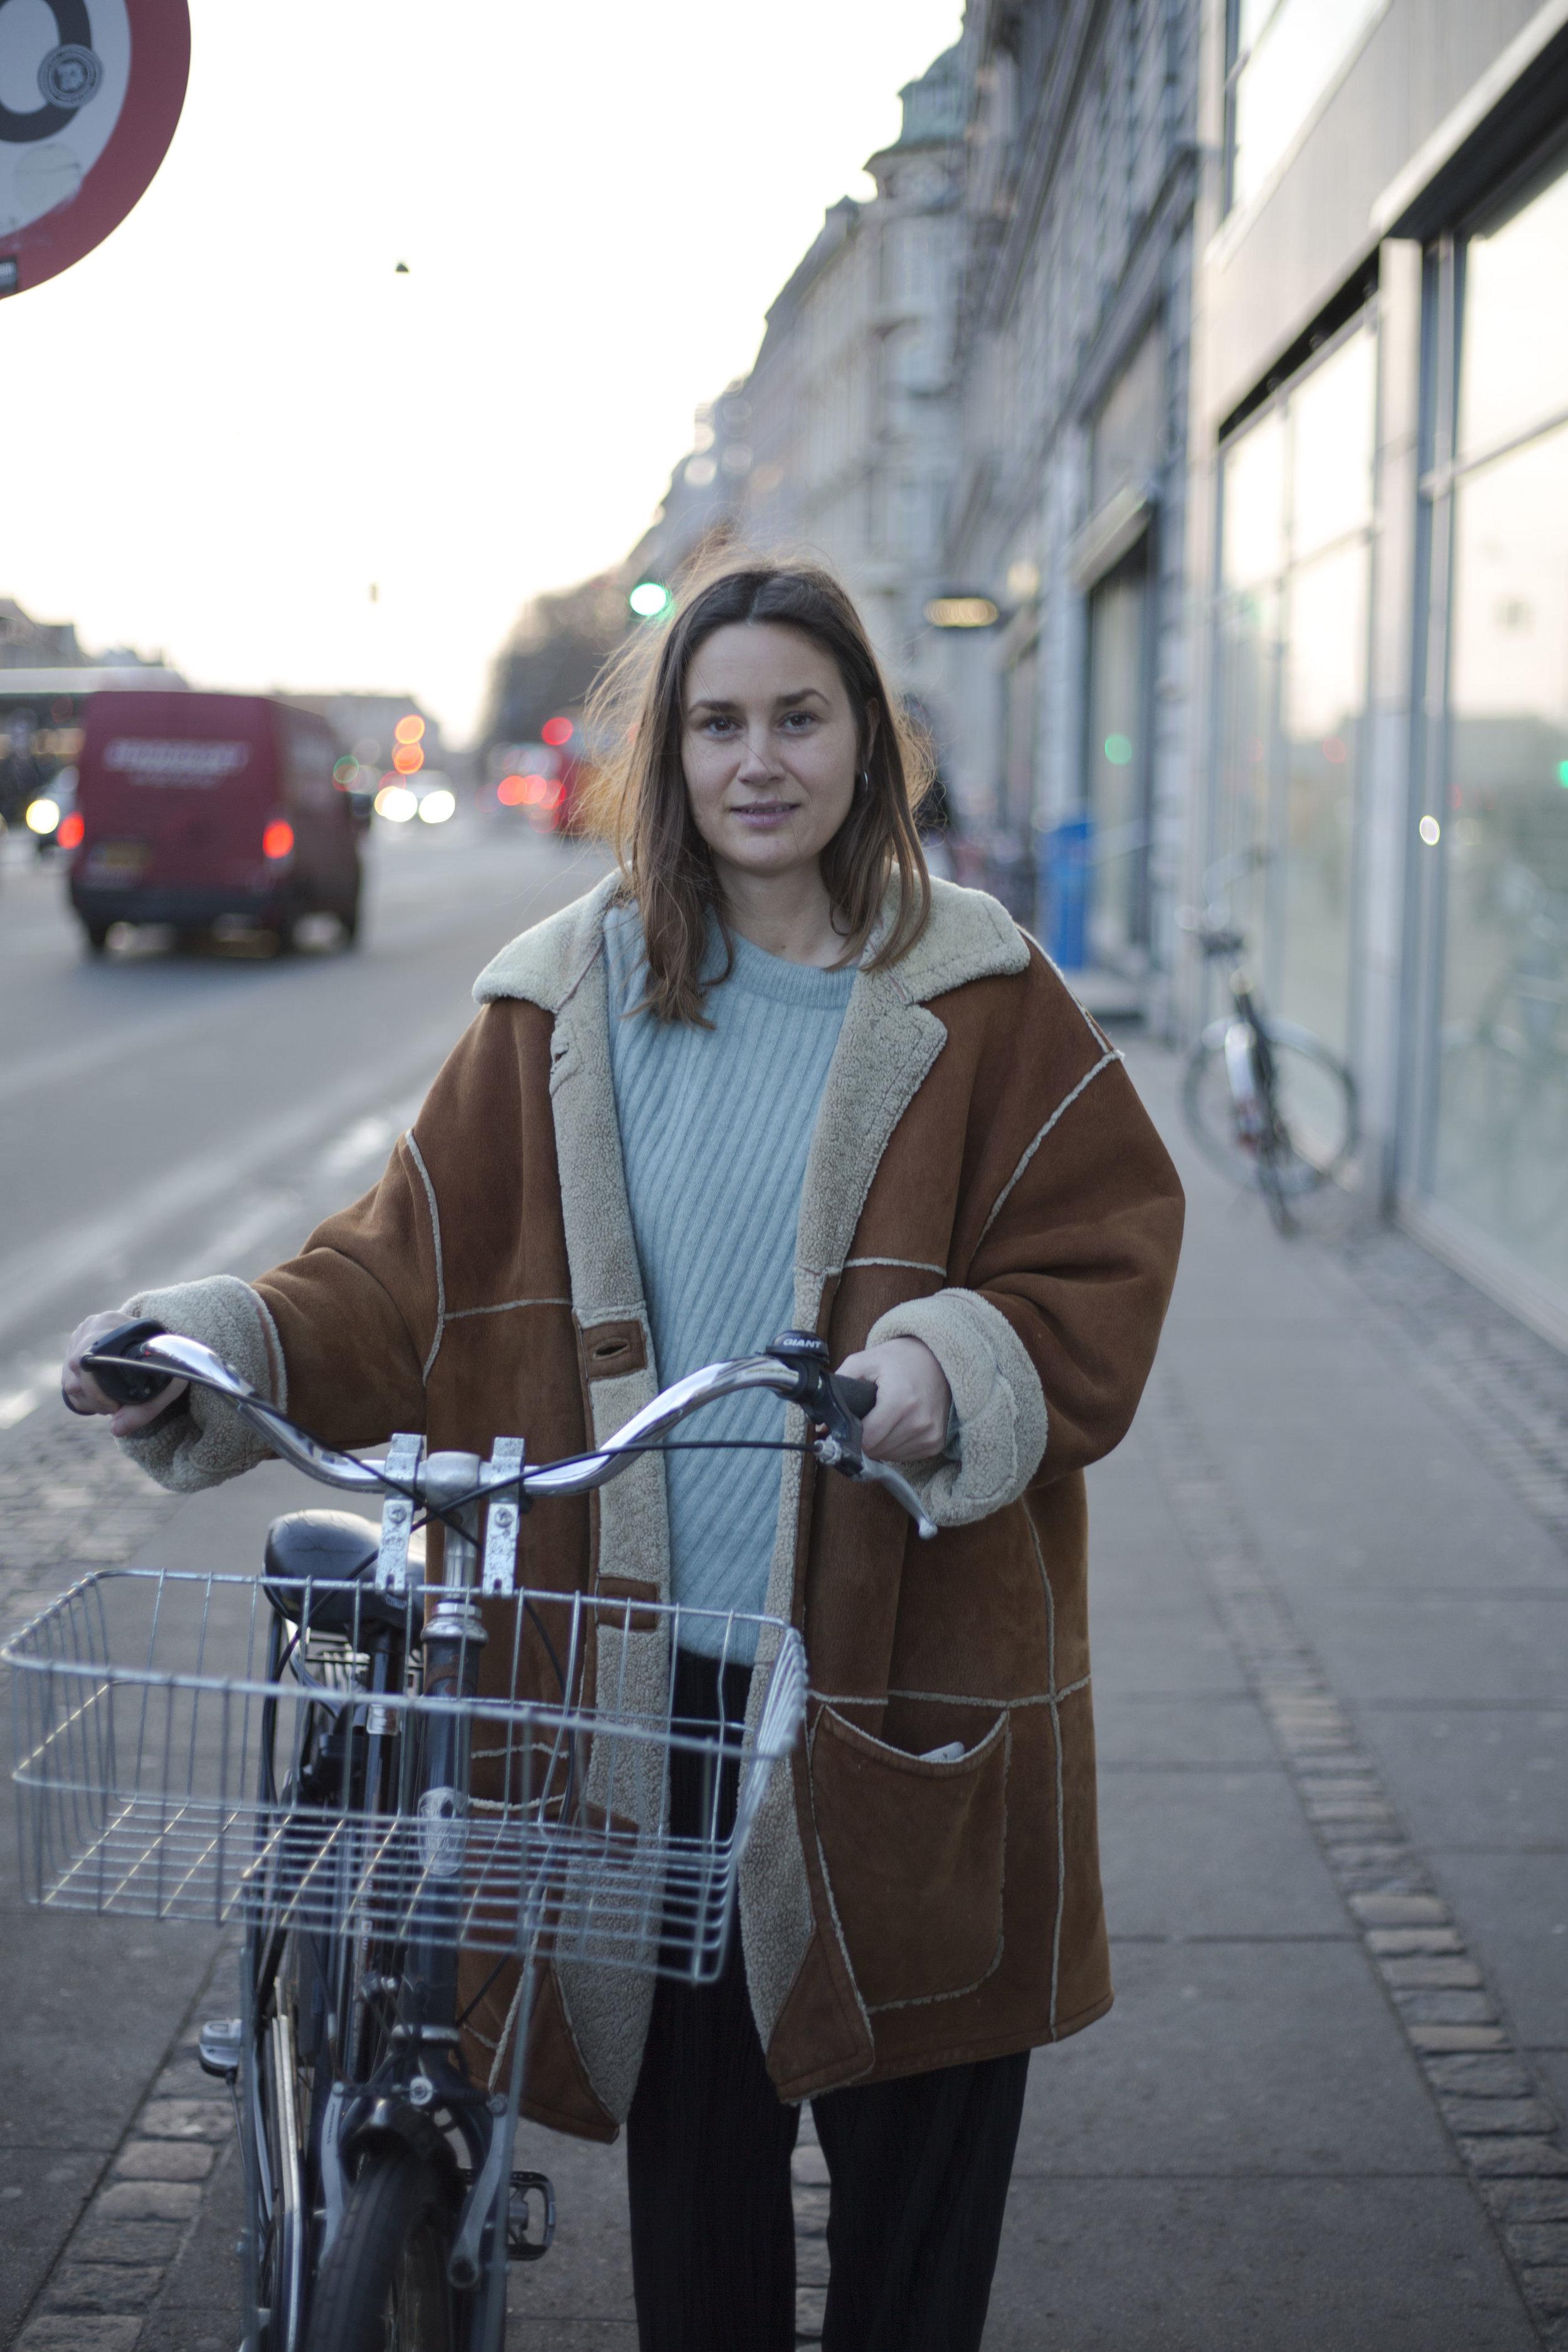 Copenhagen bicycle city with style